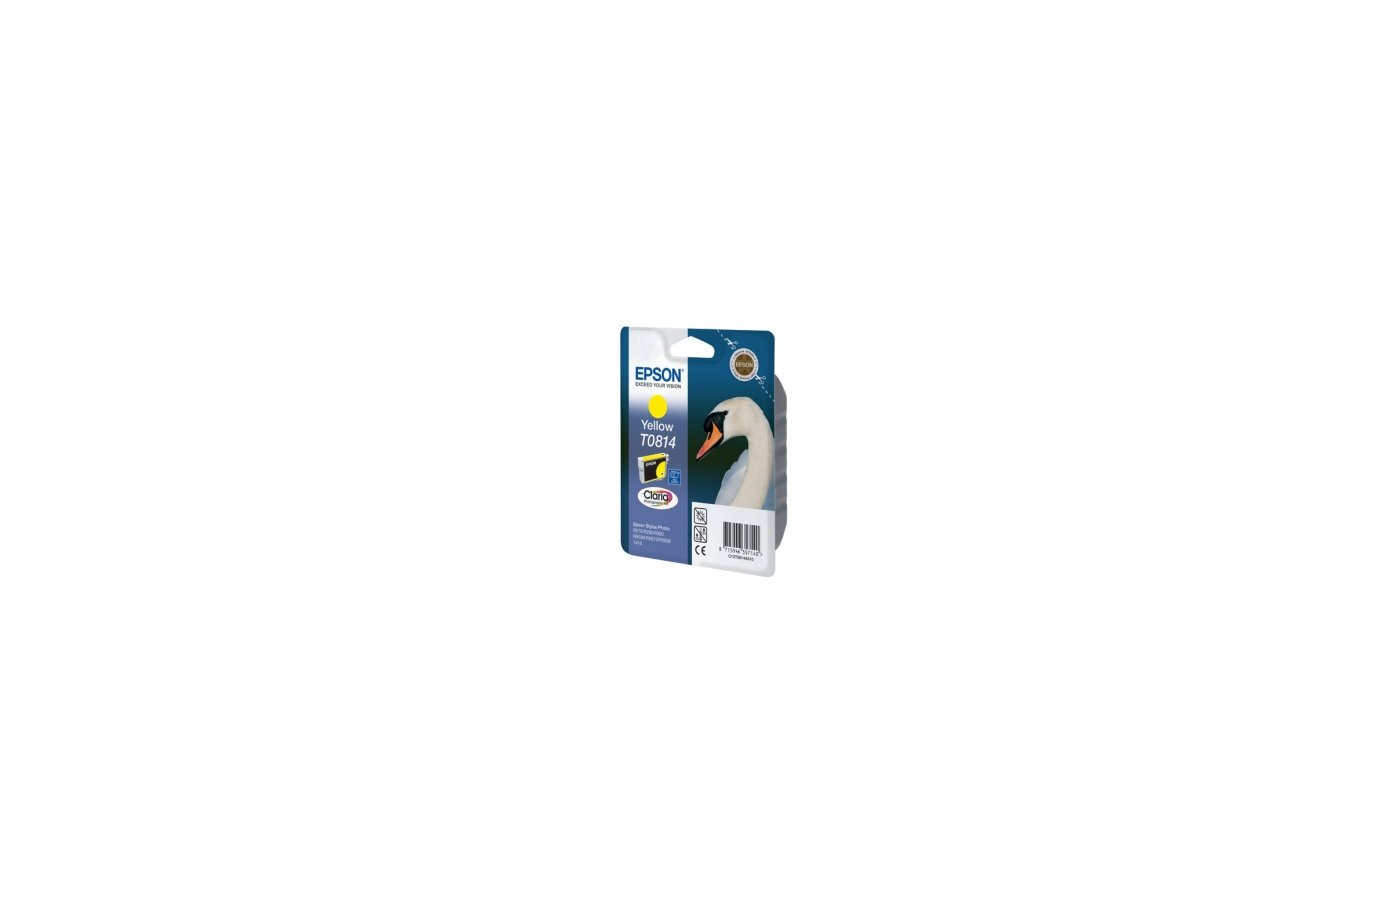 Картридж струйный Epson C13T11144A10 T0814 желтый R270/290/RX590 (замена C13T08144A)